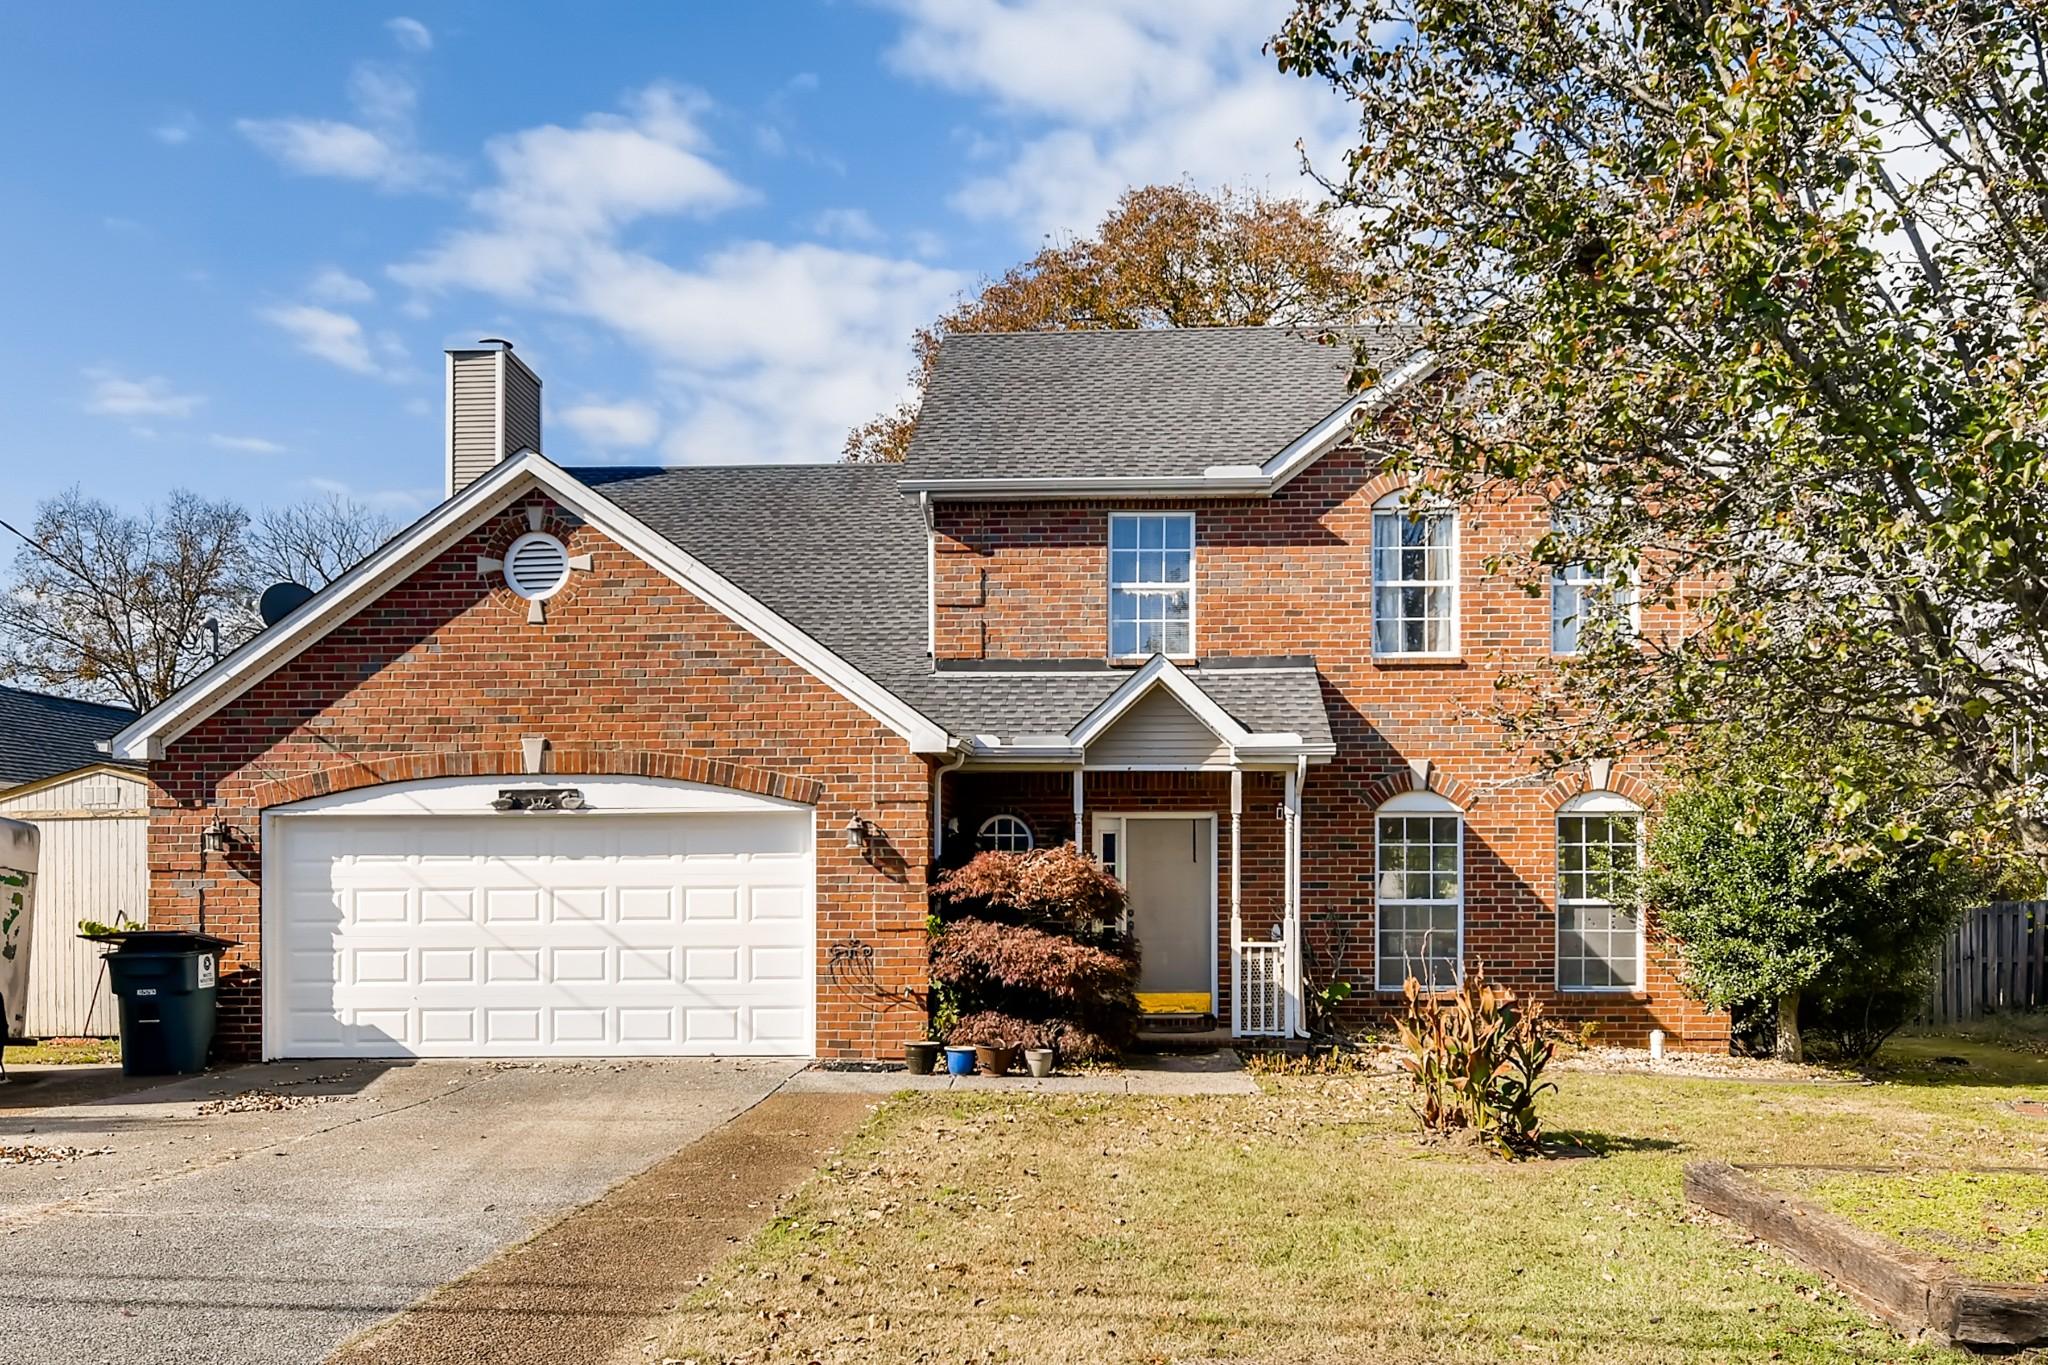 370 Davids Way, LA VERGNE, TN 37086 - LA VERGNE, TN real estate listing